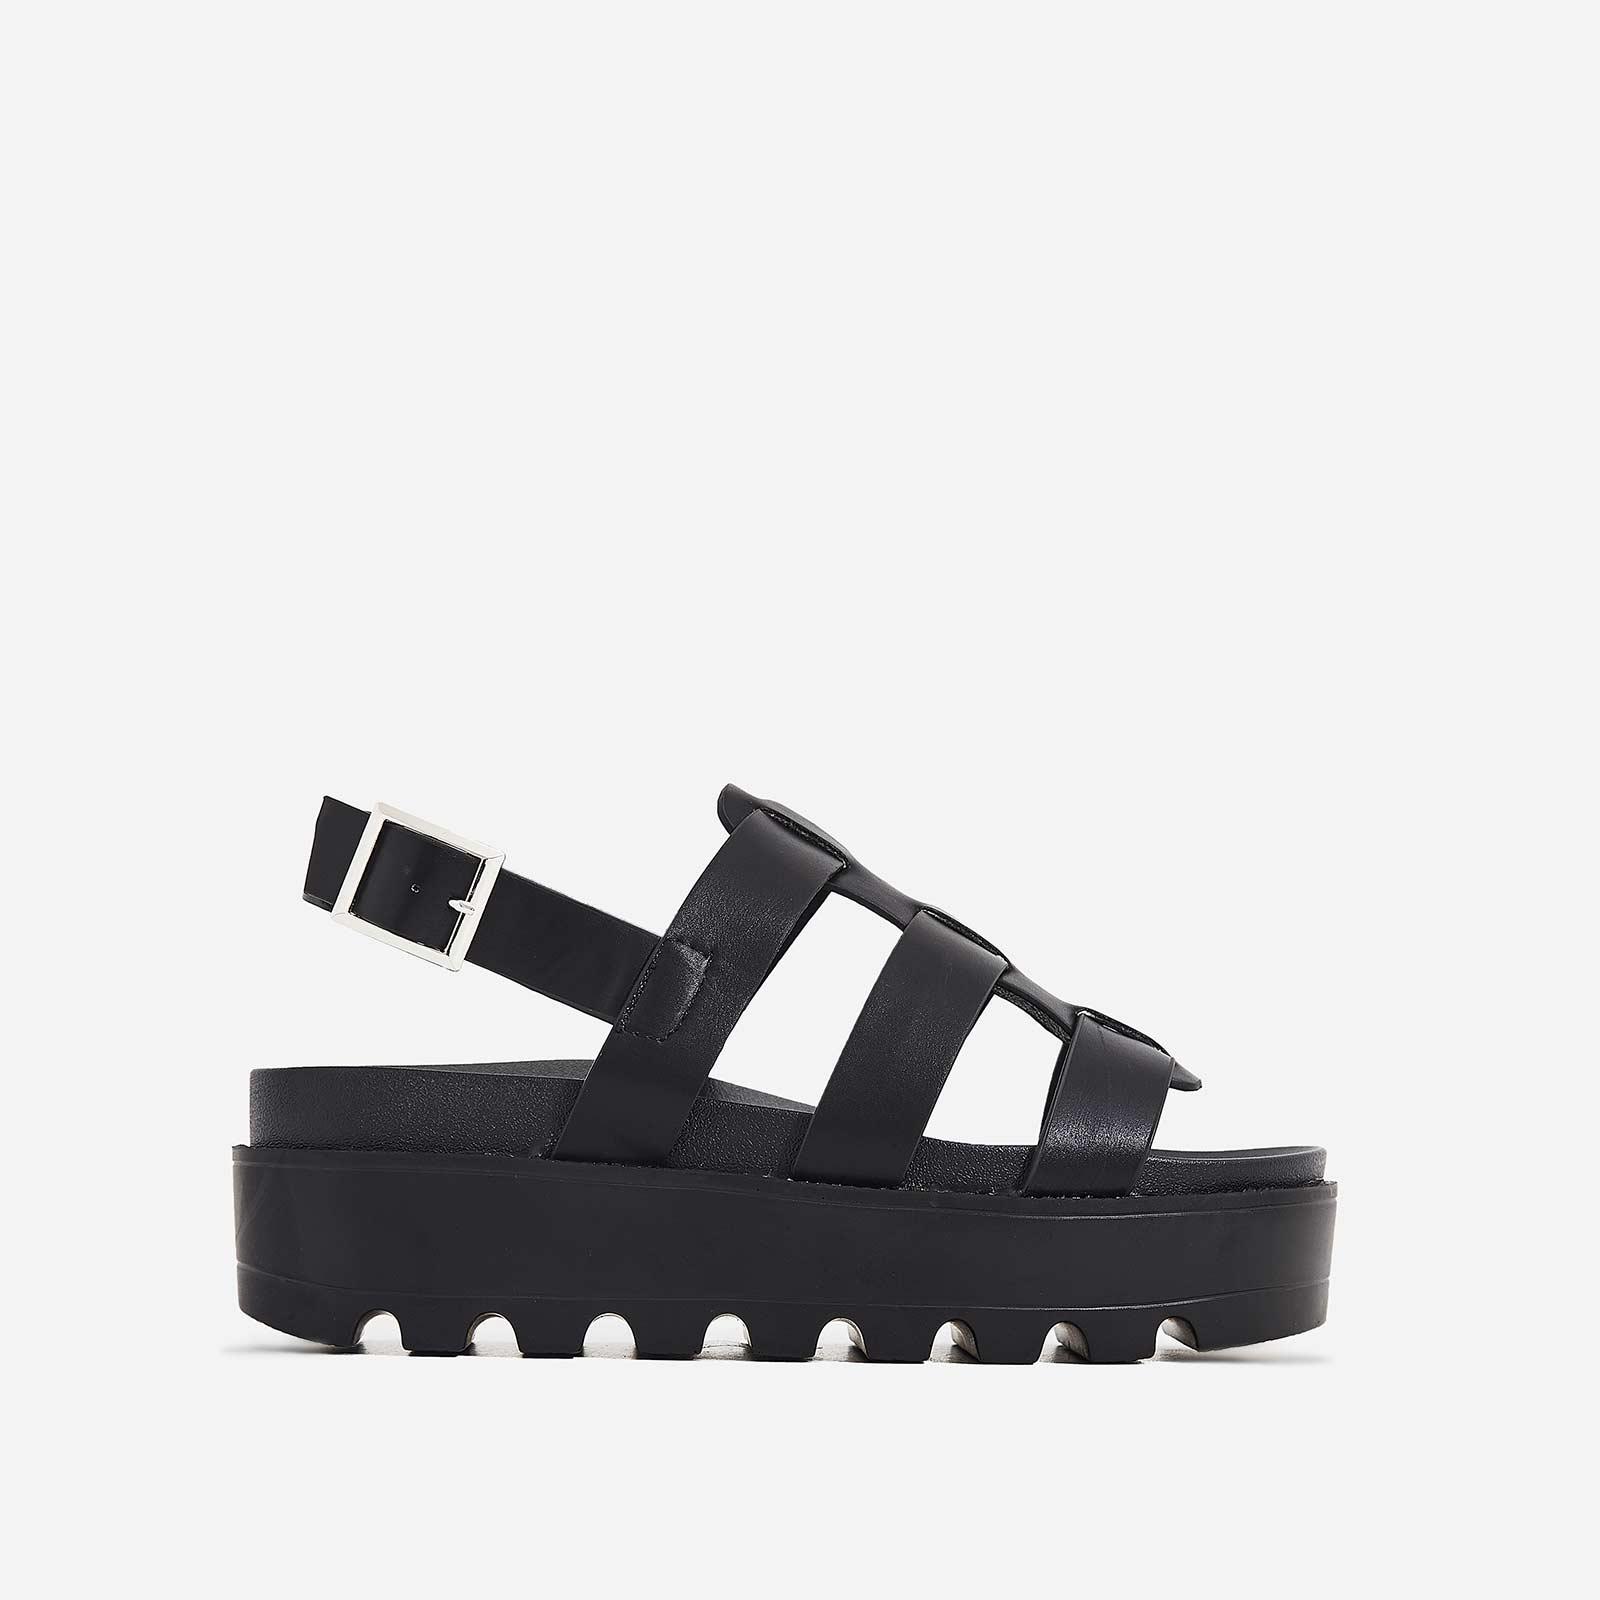 Zander Chunky Sole Sandal In Black Faux Leather